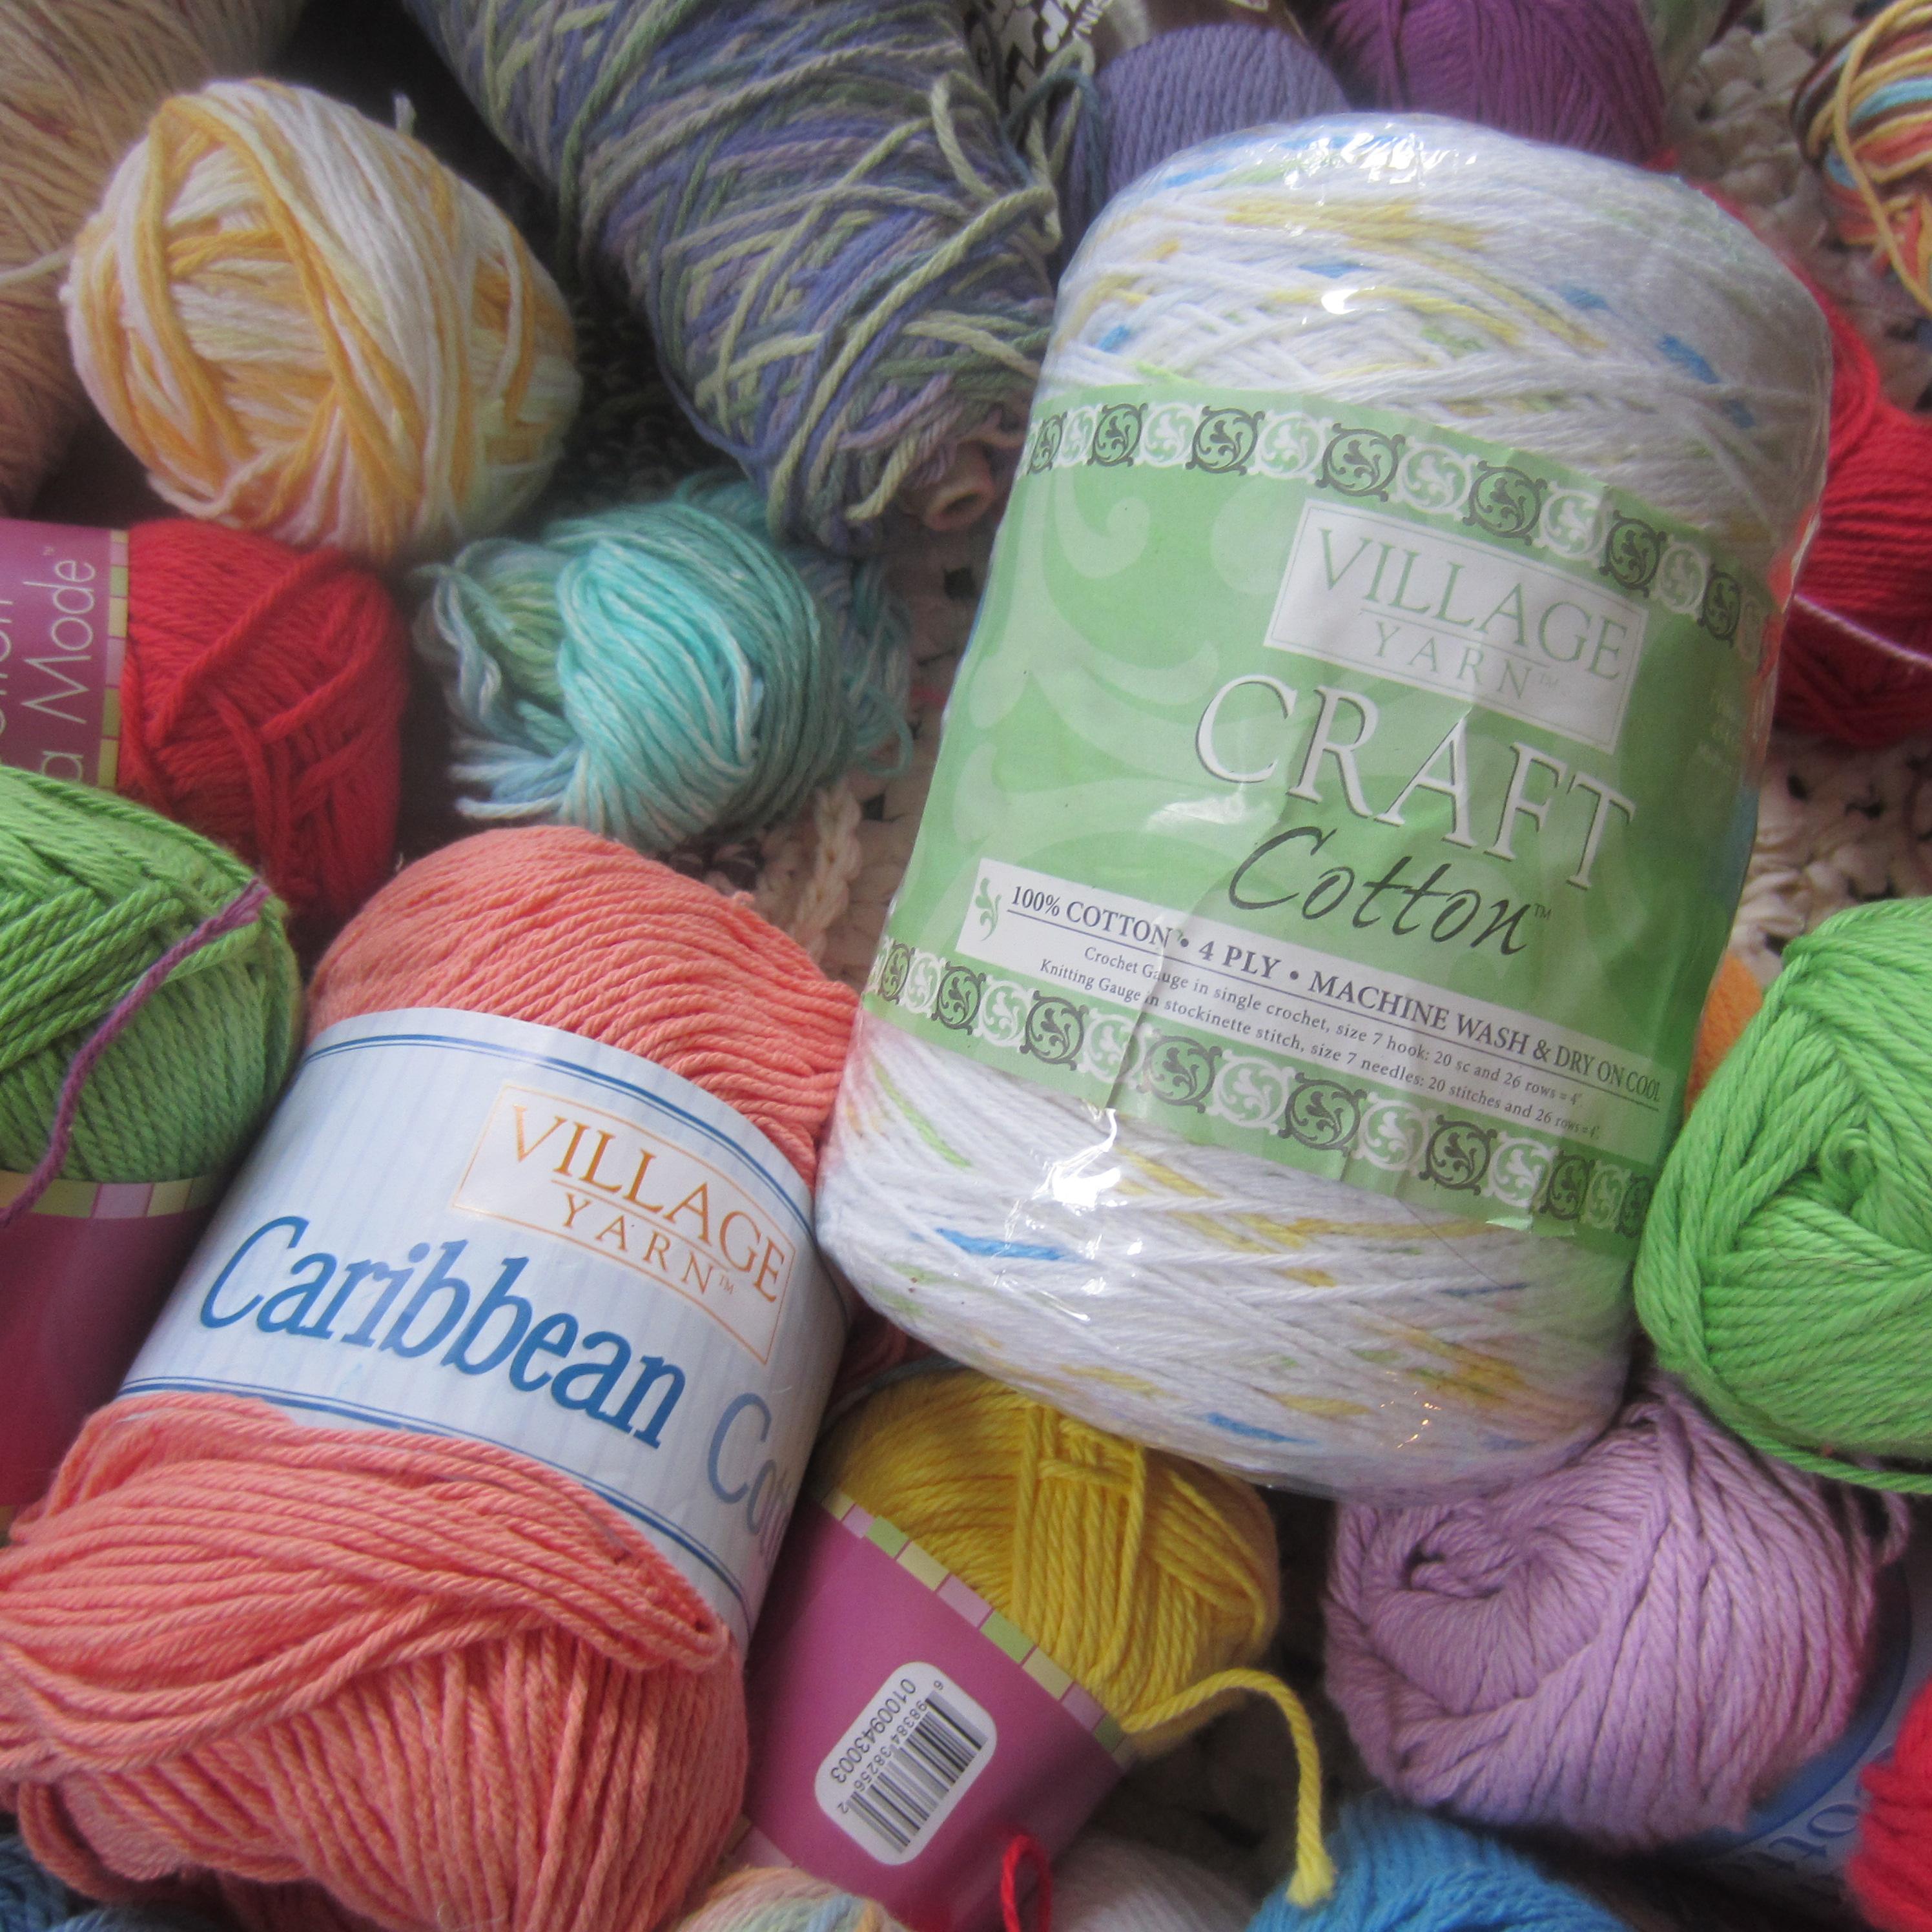 Crochet Patterns Made With Cotton Yarn : cotton yarn 006